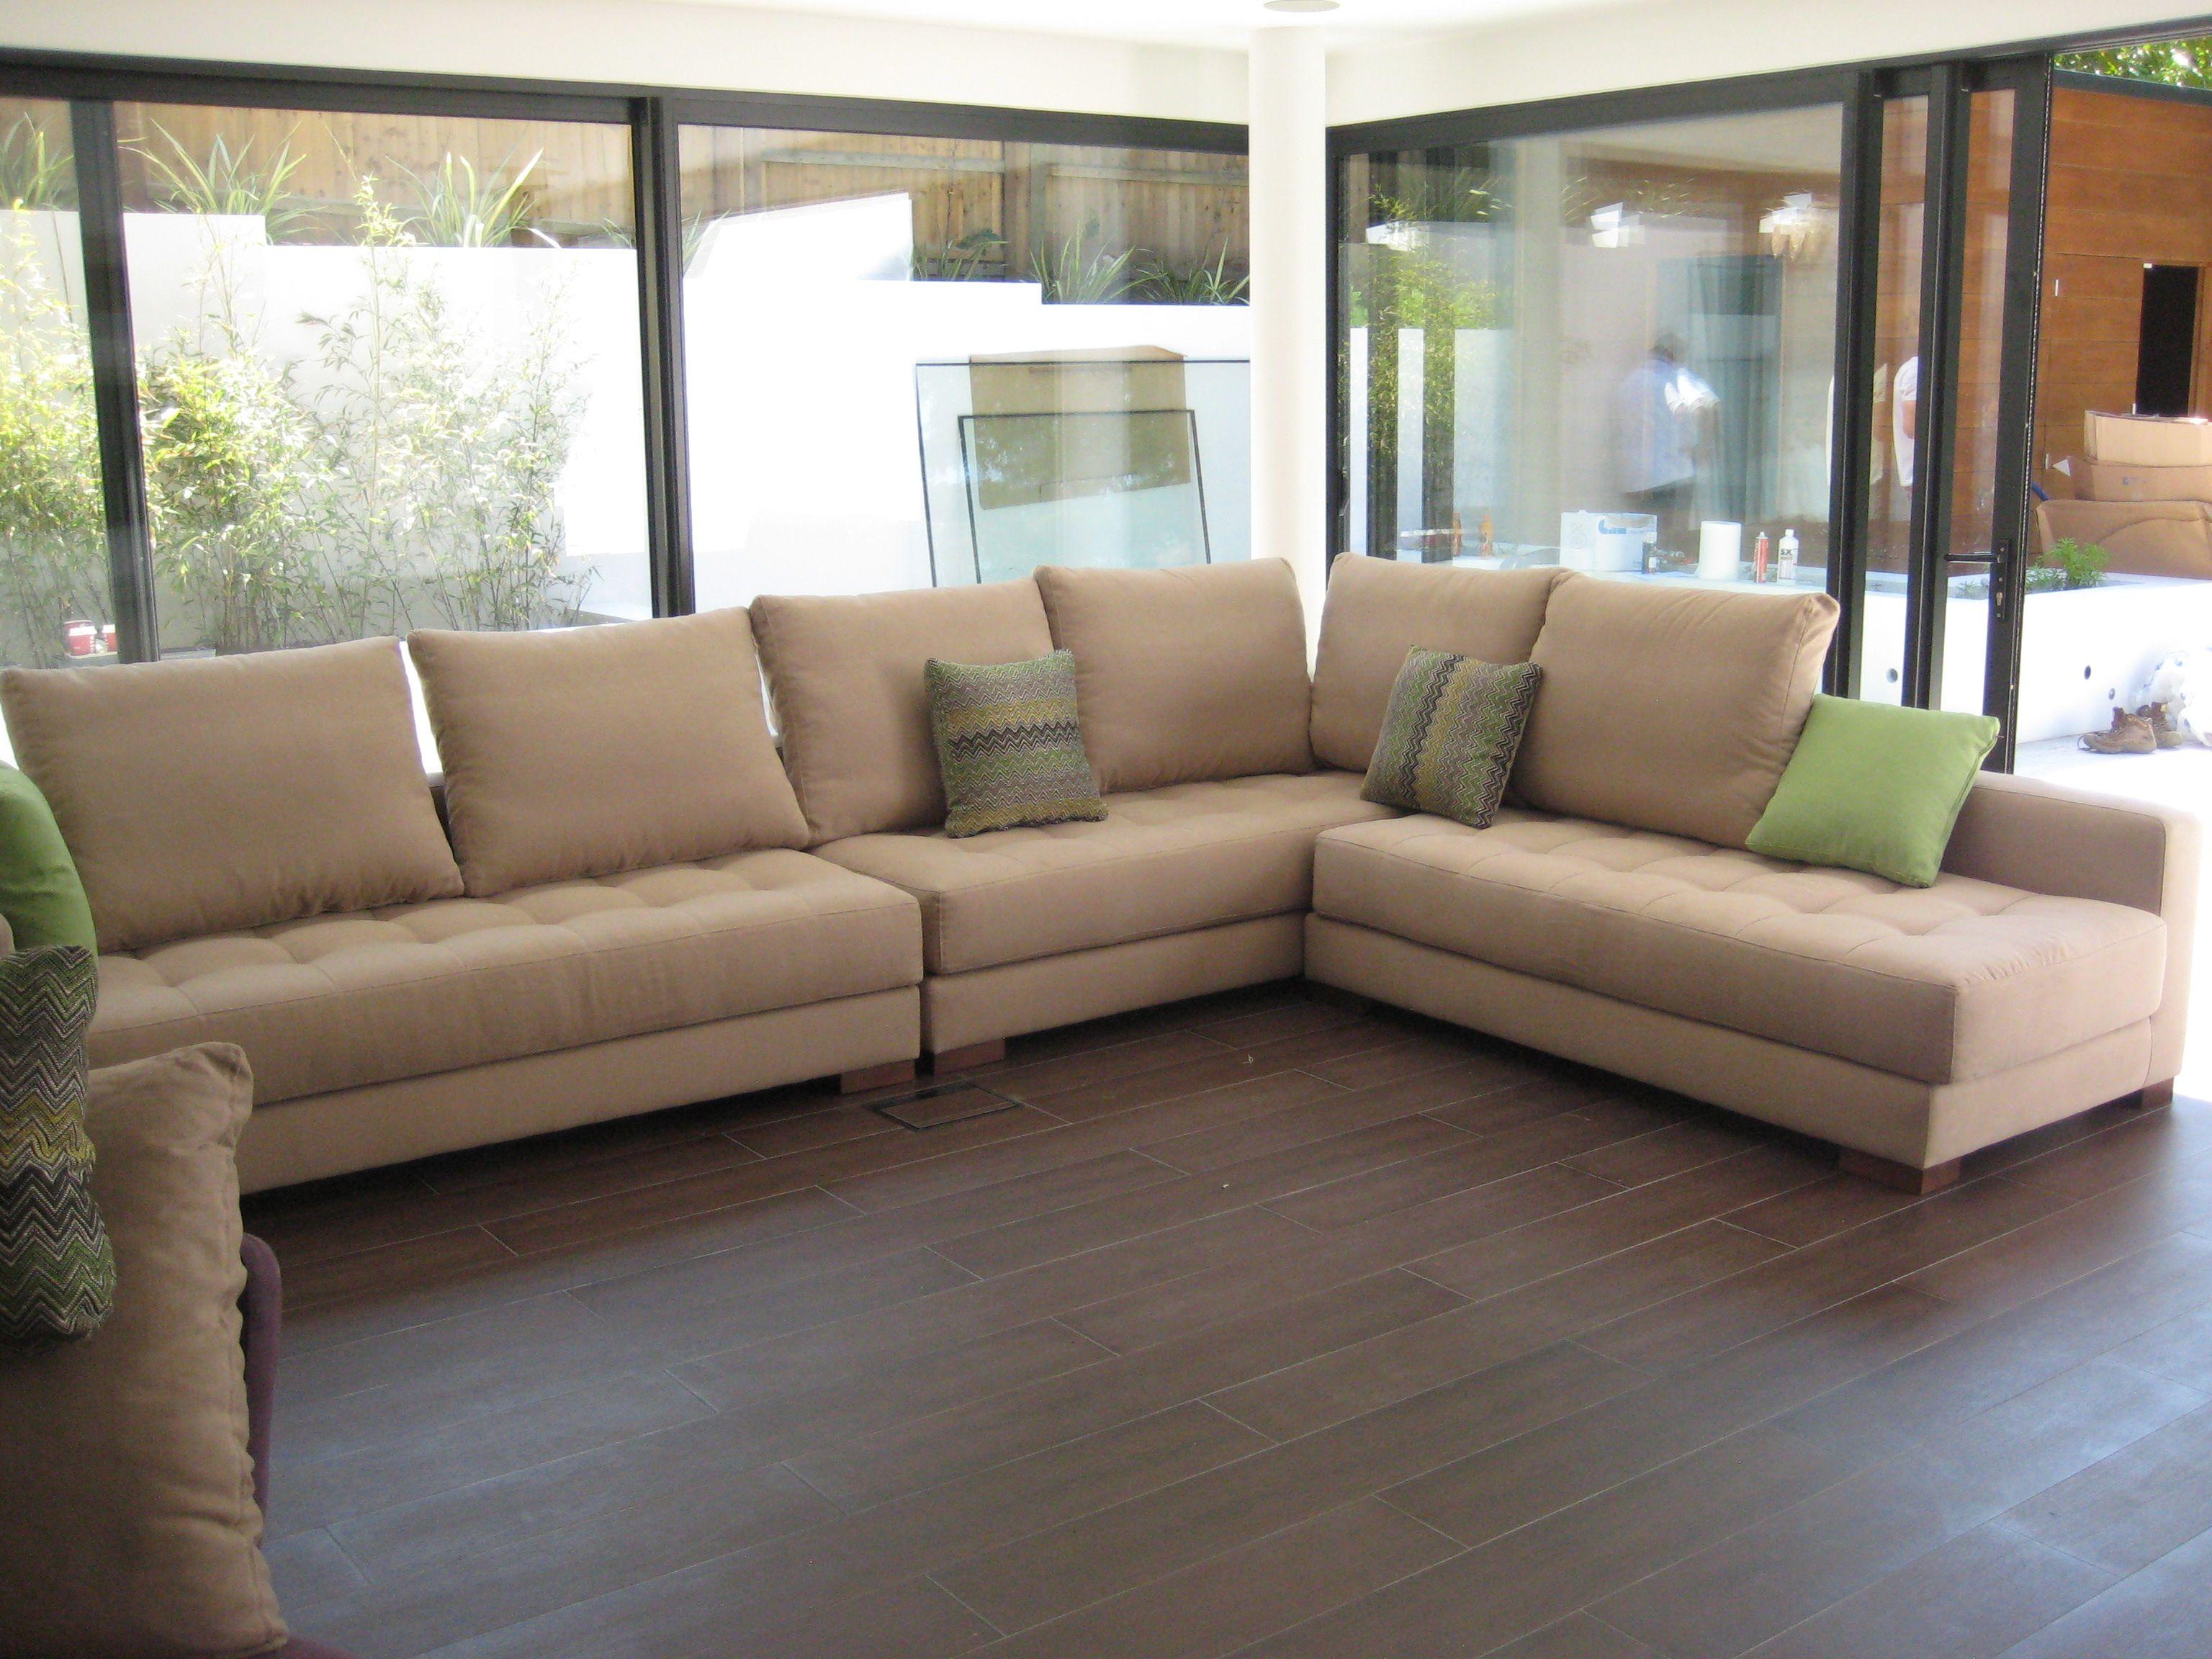 100 Cm Wide Sofa Bed Madrid Yecla Sectional Modules In Romo Linara Fabrics